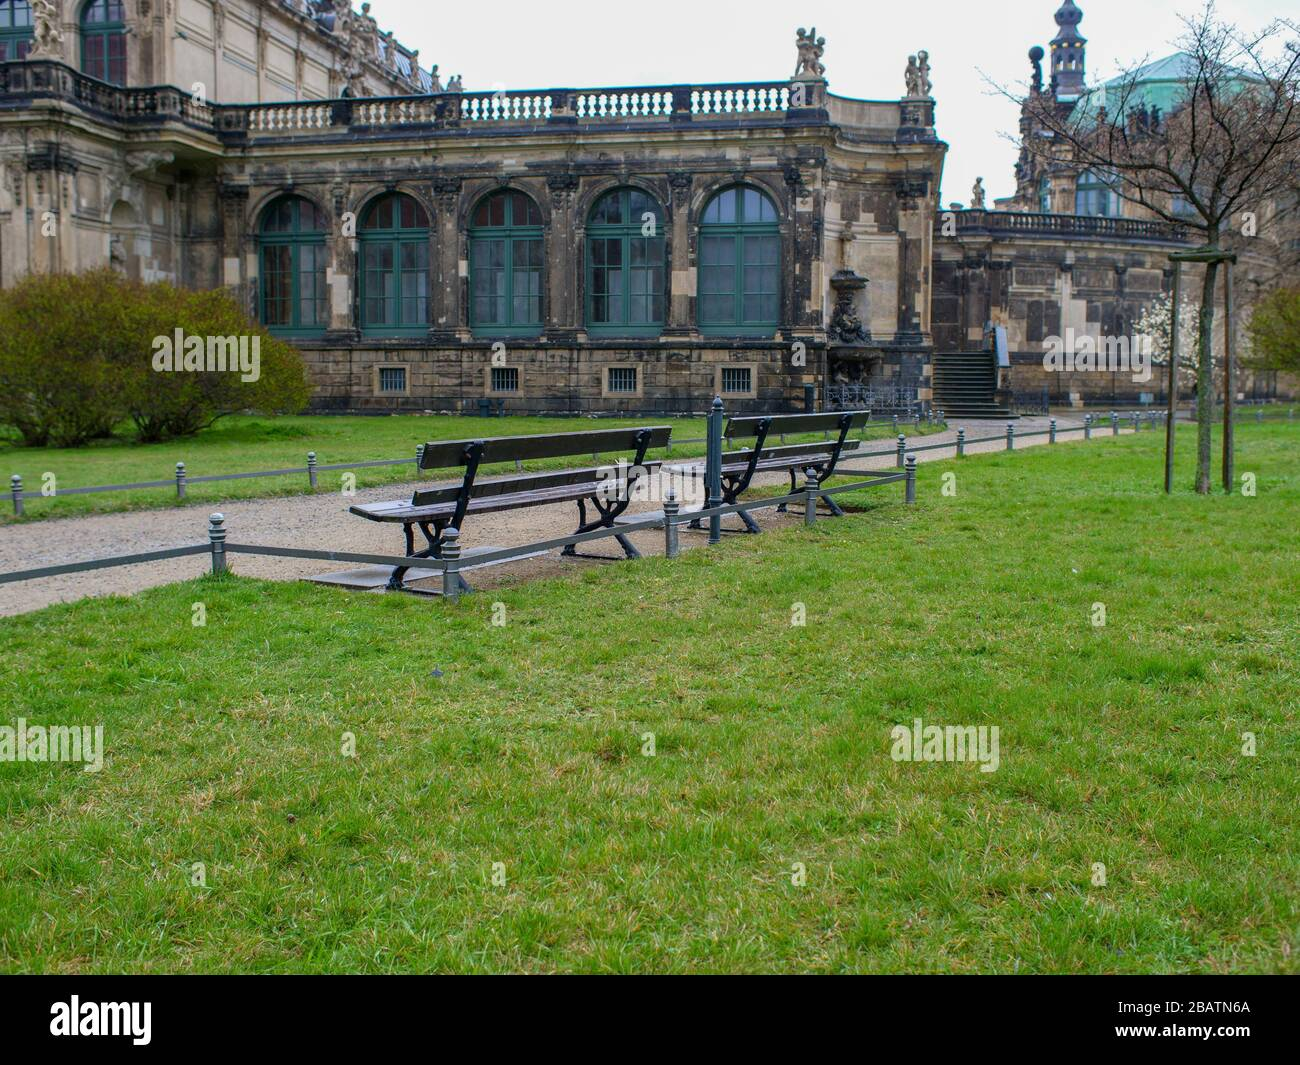 Leere Parkbänke während Coronavirus am Dresden Zwinger Teich Zwingerteich COVID-19 Lockdown 2020 Stock Photo